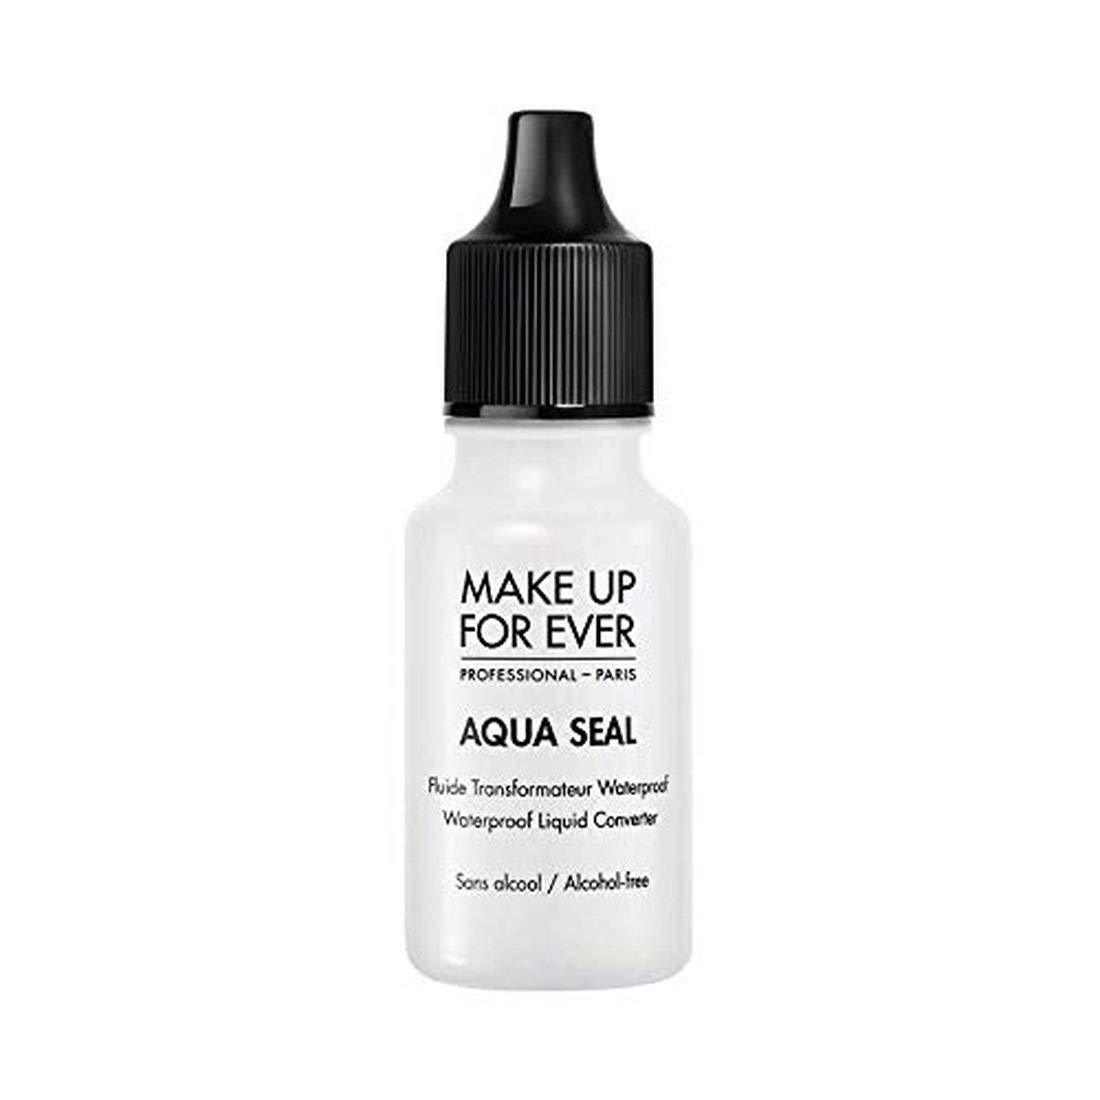 MAKE UP FOR EVER Eye Seal 0.4 oz